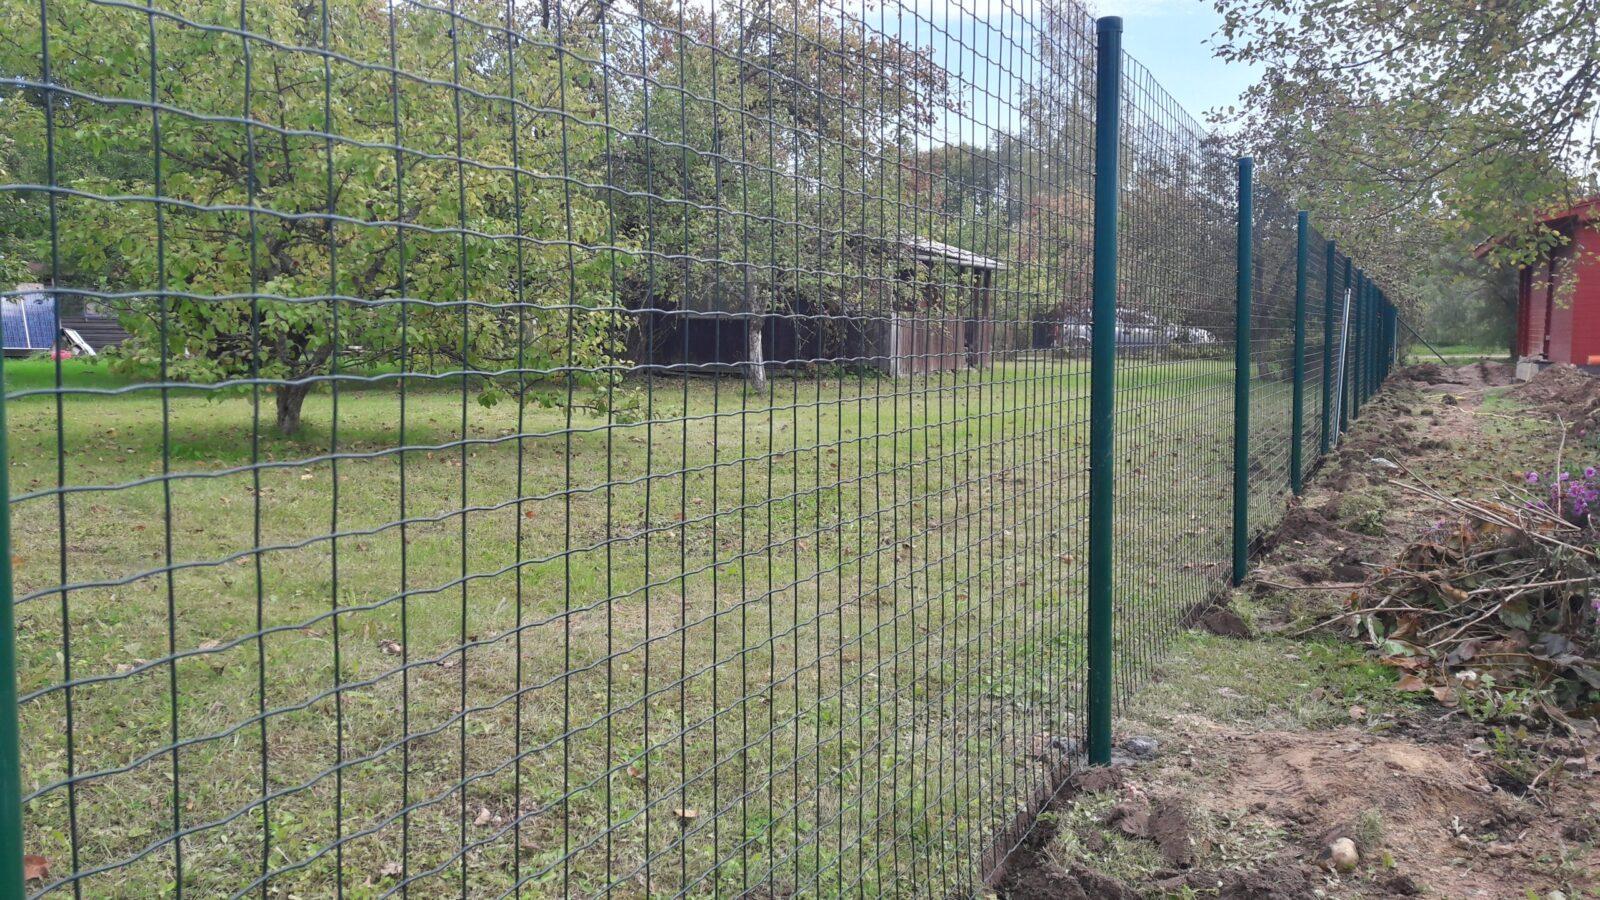 https://zogs.lv/wp-content/uploads/2016/10/Metinātie-ruļļu-žogi-8-scaled.jpg